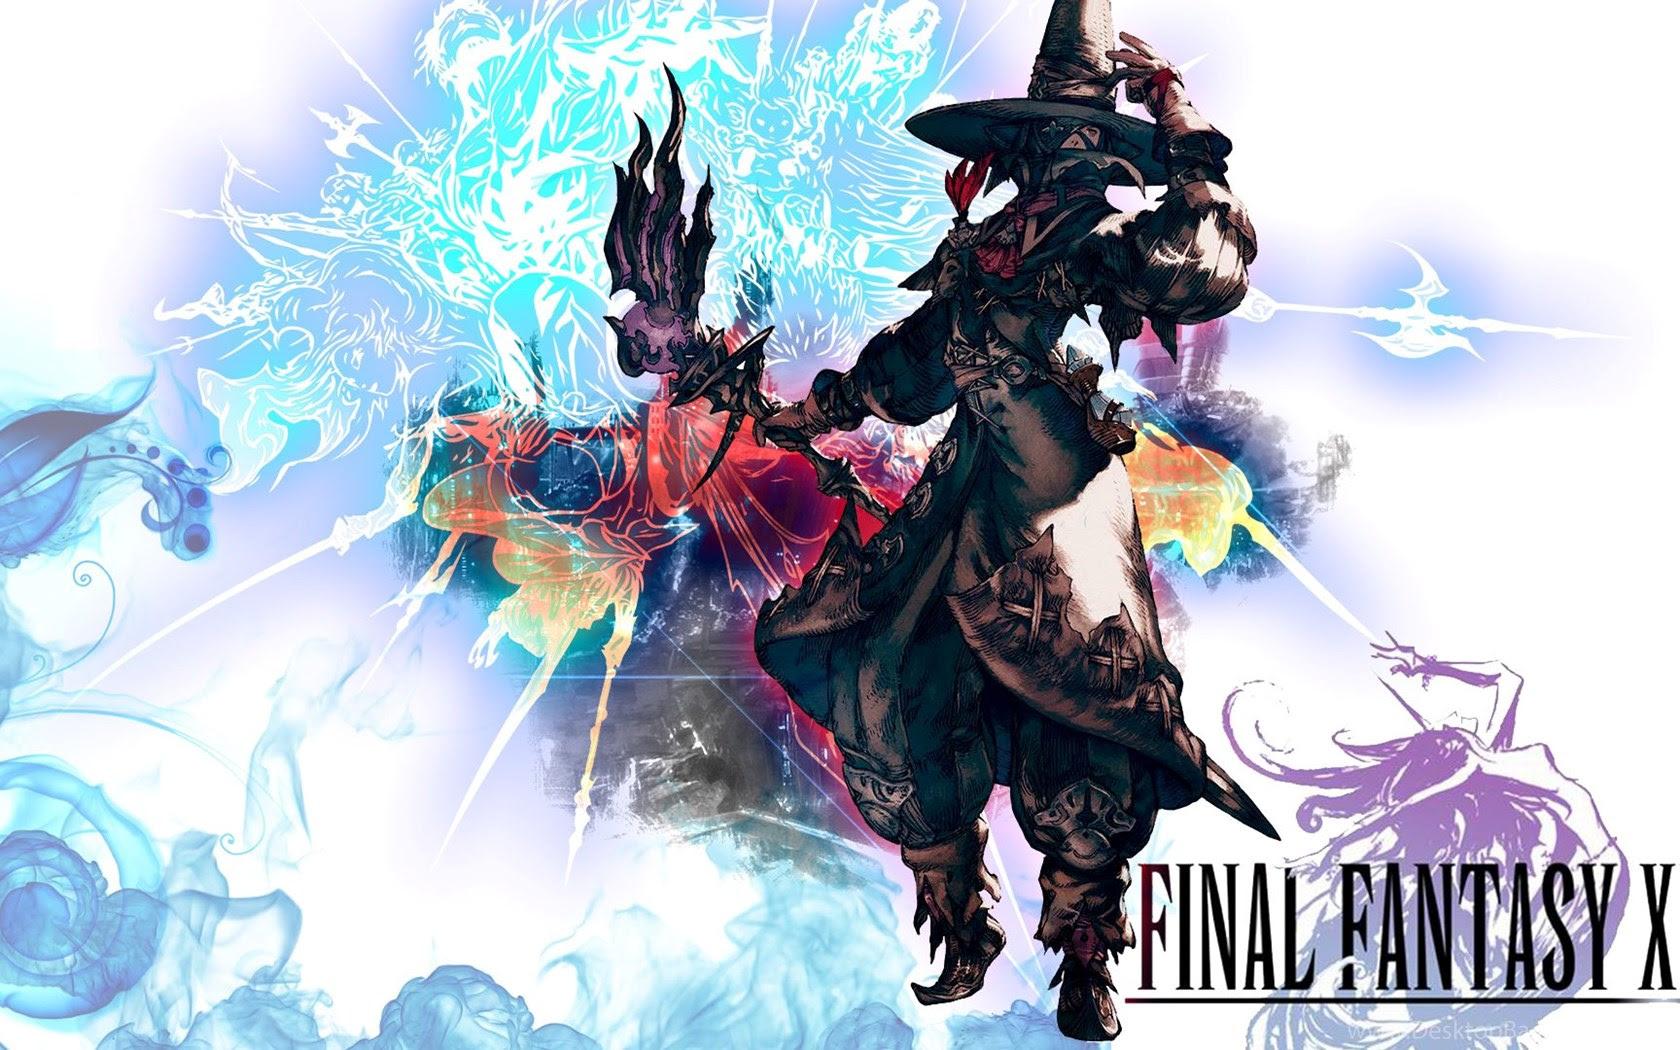 Final Fantasy Xiv Hd Wallpapers Wallpaper Game Wallpapers